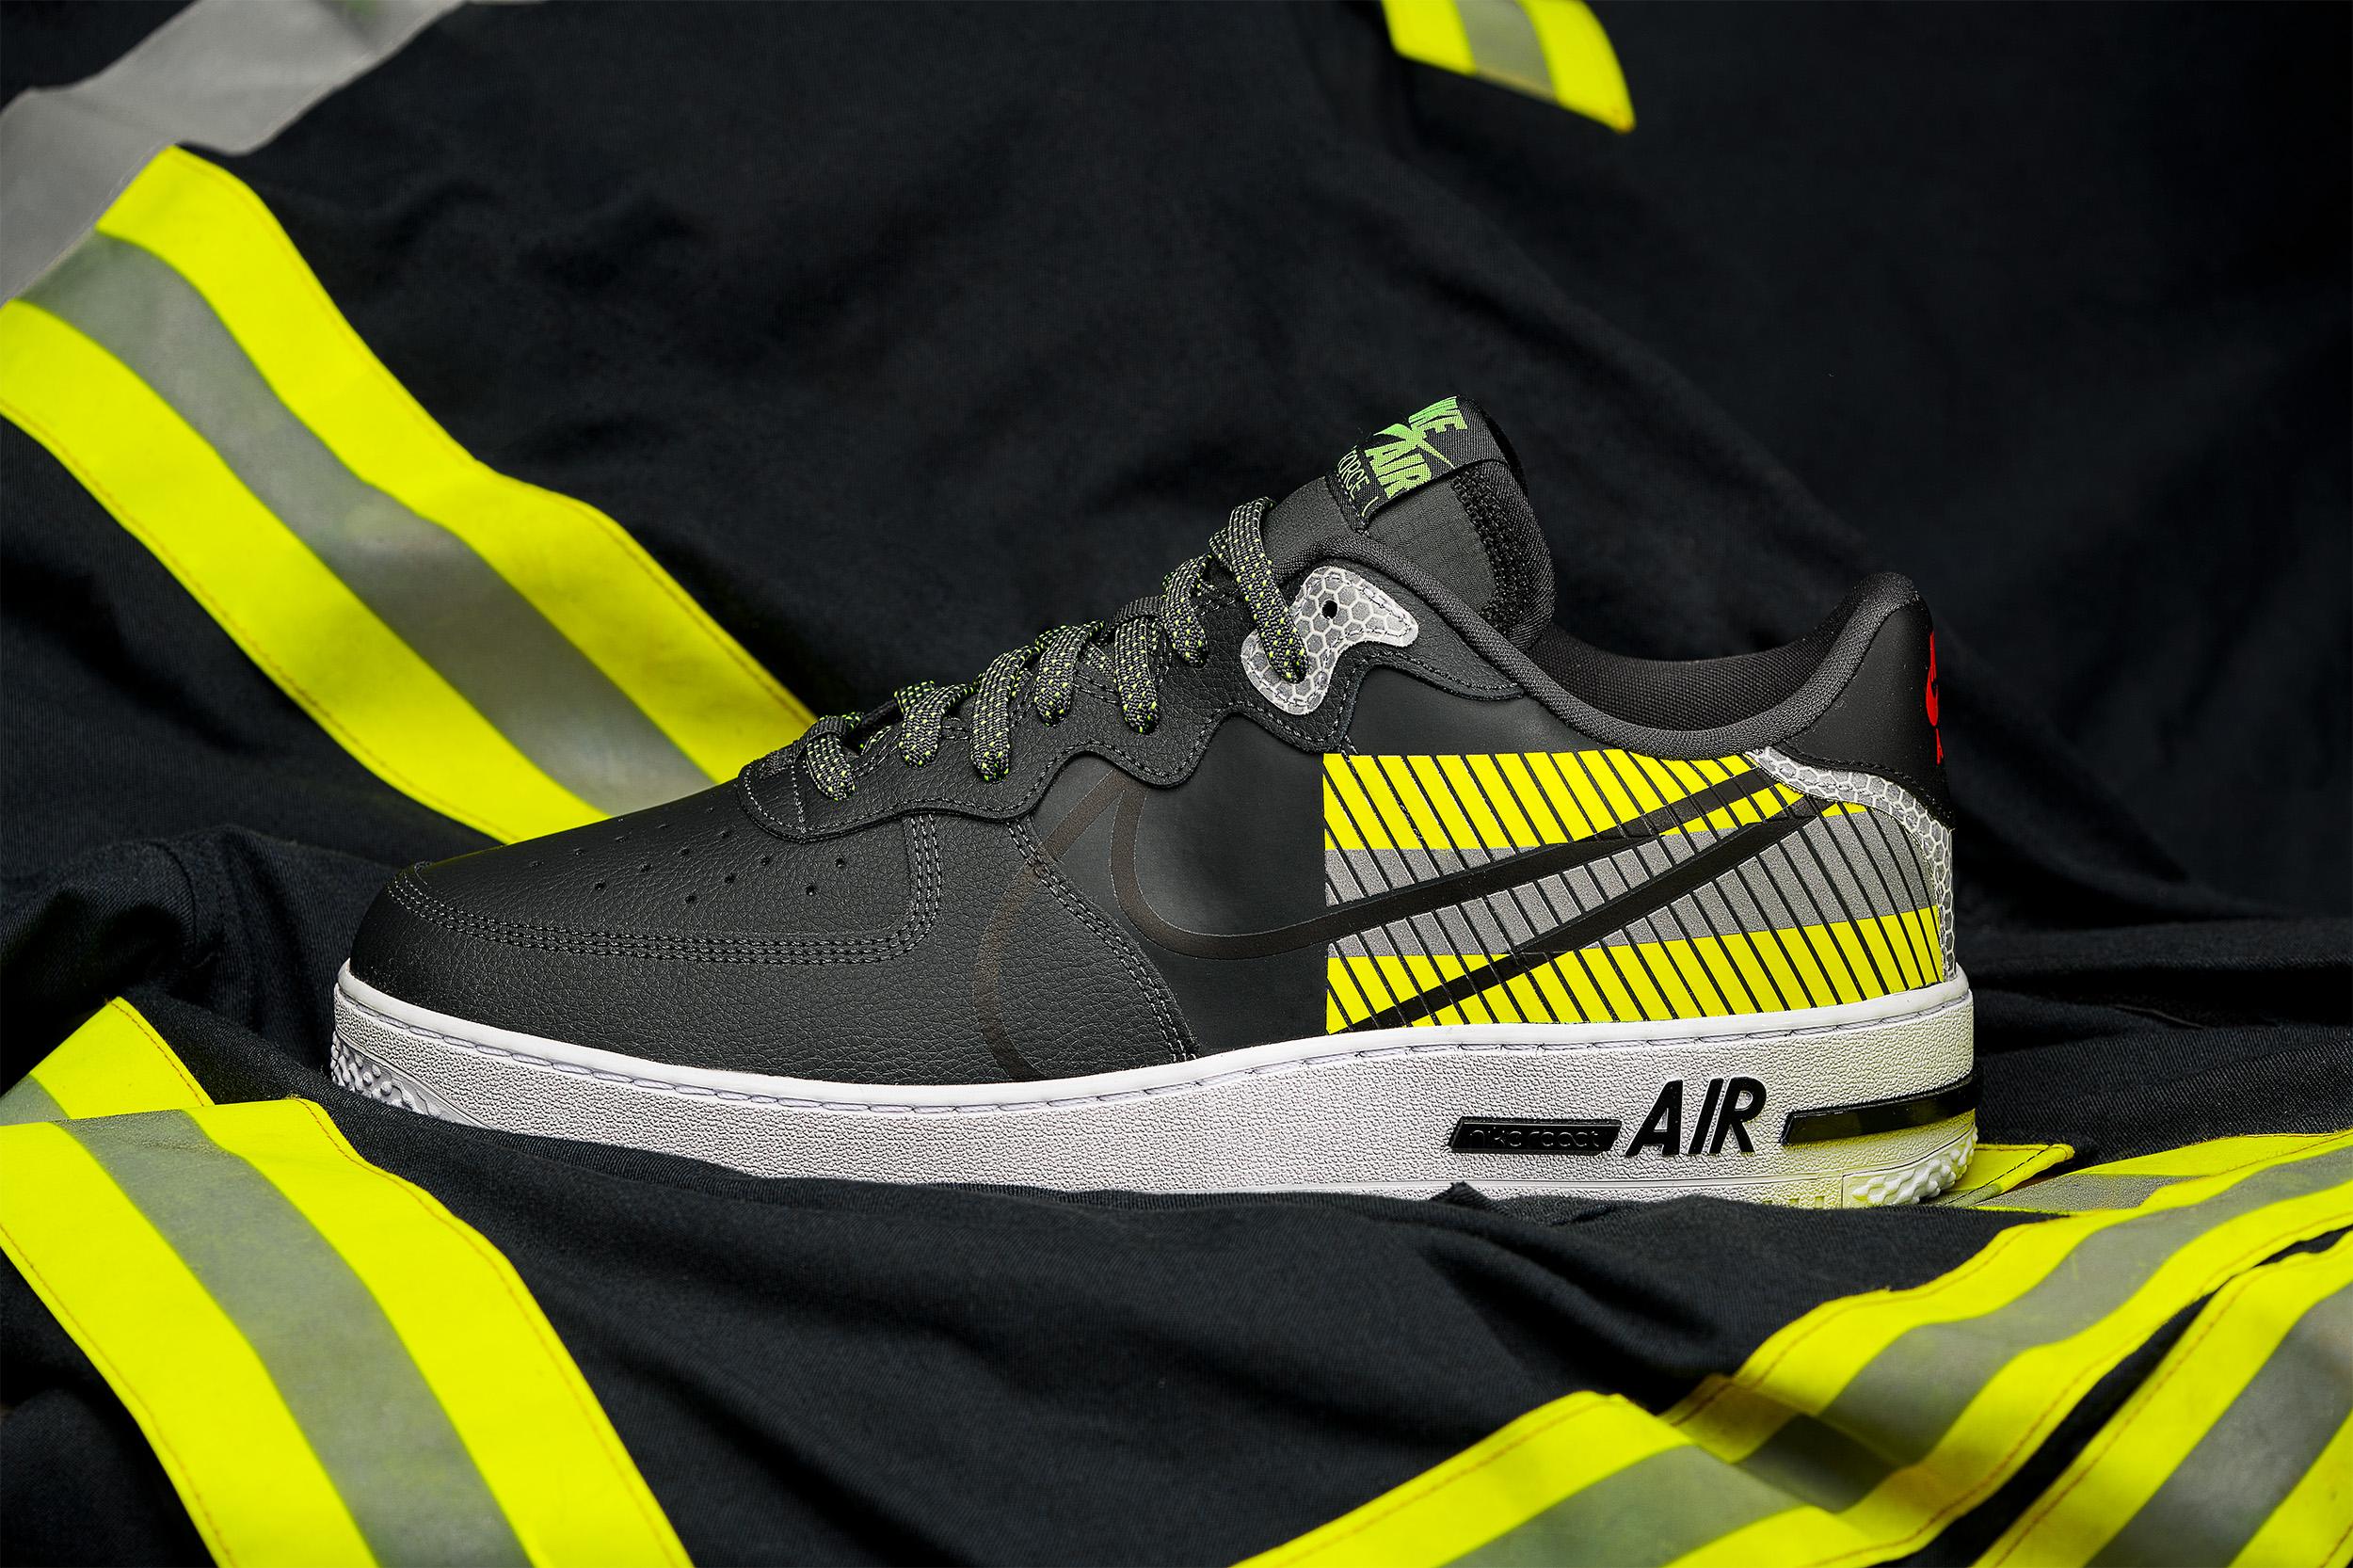 Nike_3M_Air_Force_1_React_LX_Black_Website